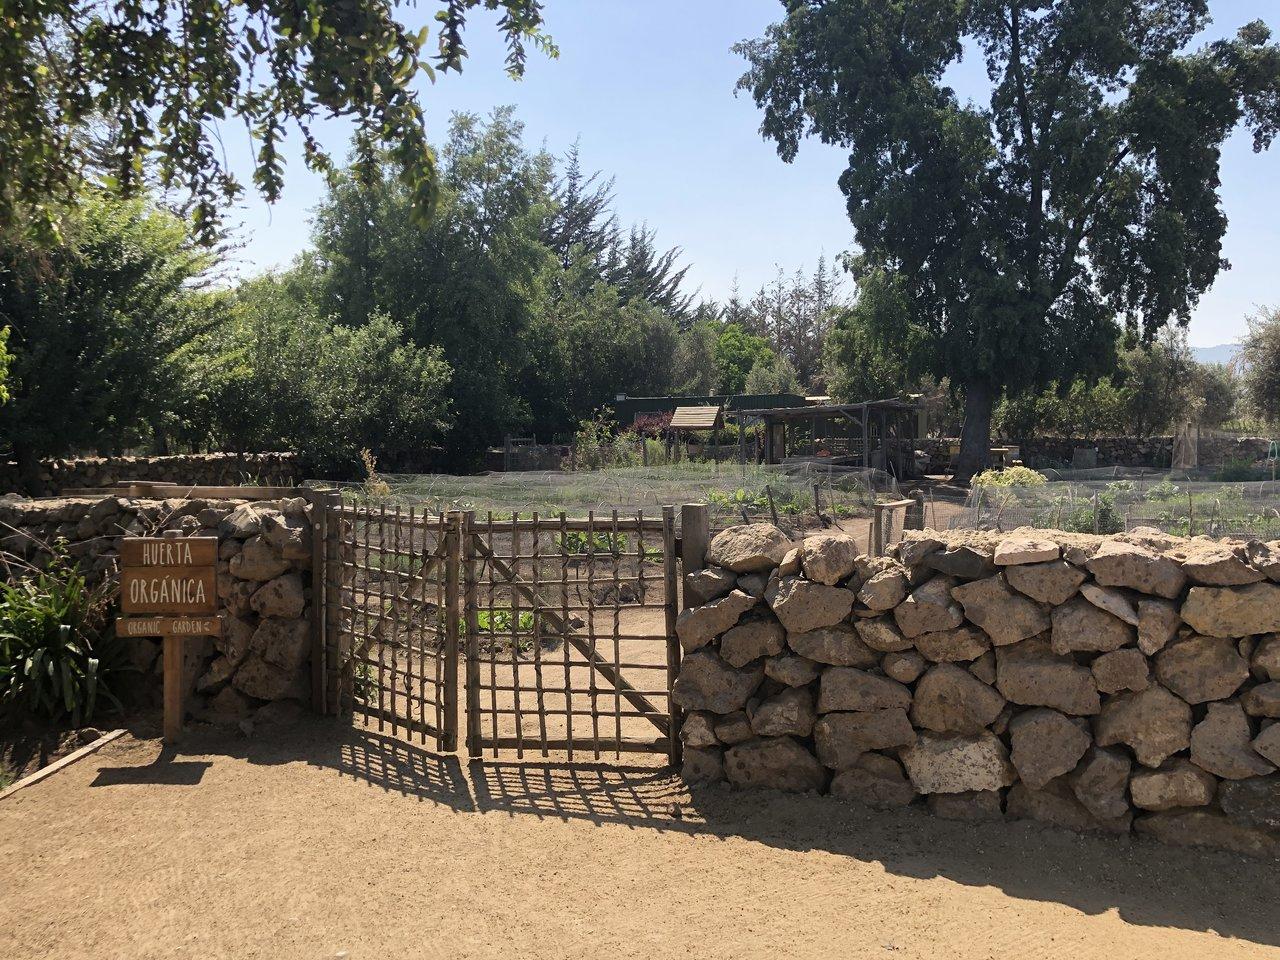 Organic Garden at Emiliana | Photo taken by Melody B